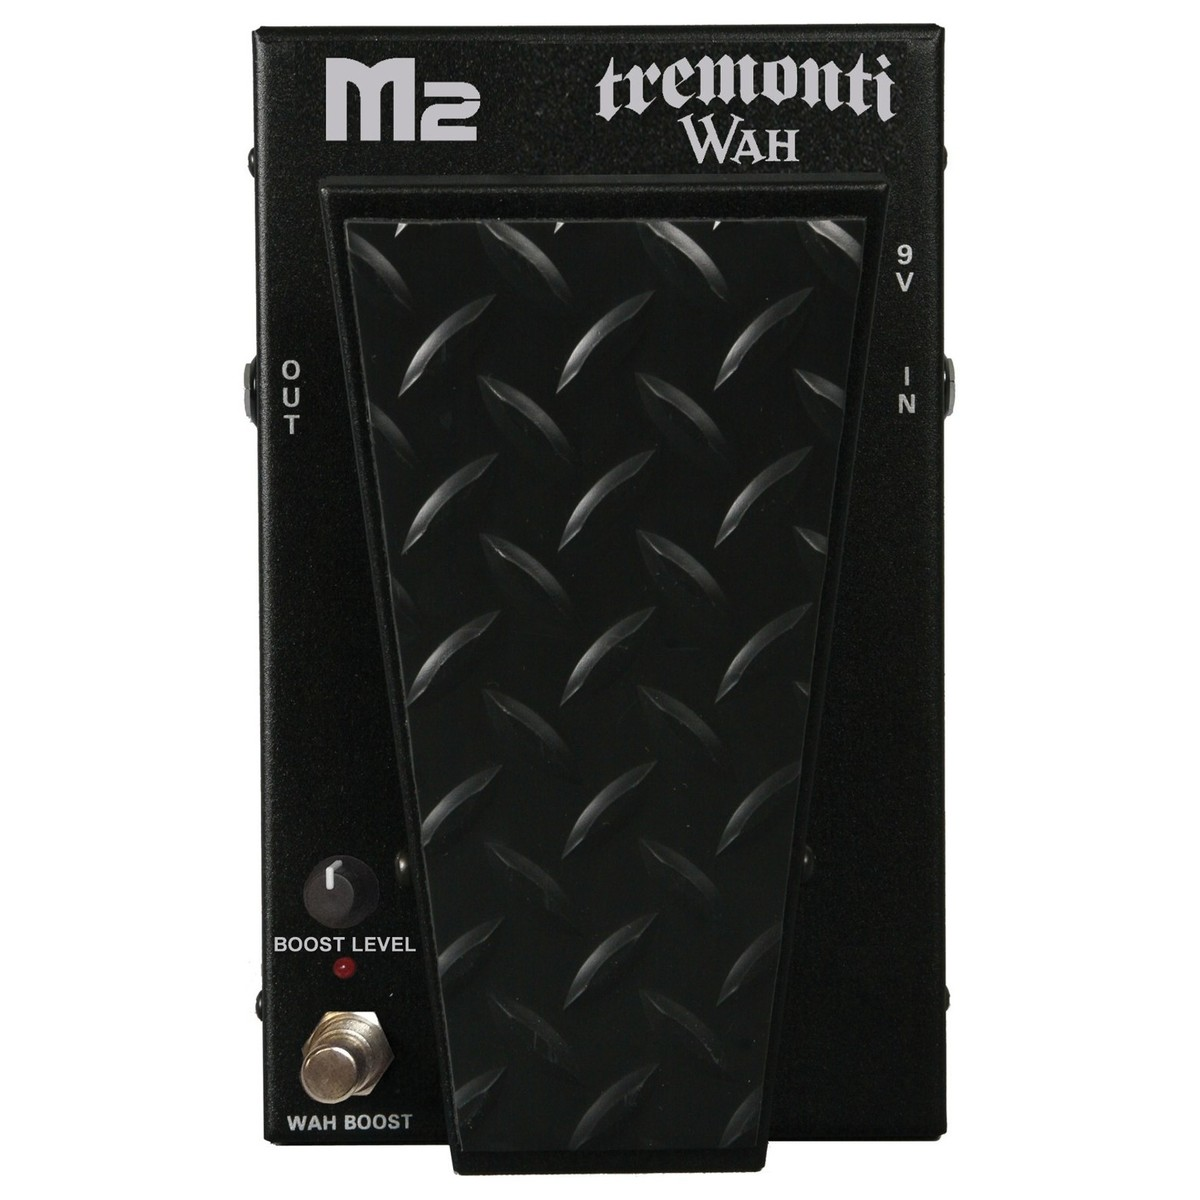 Morley M2 Tremonti Wah At Gear4musiccom Re Pedal Buffer Circuits